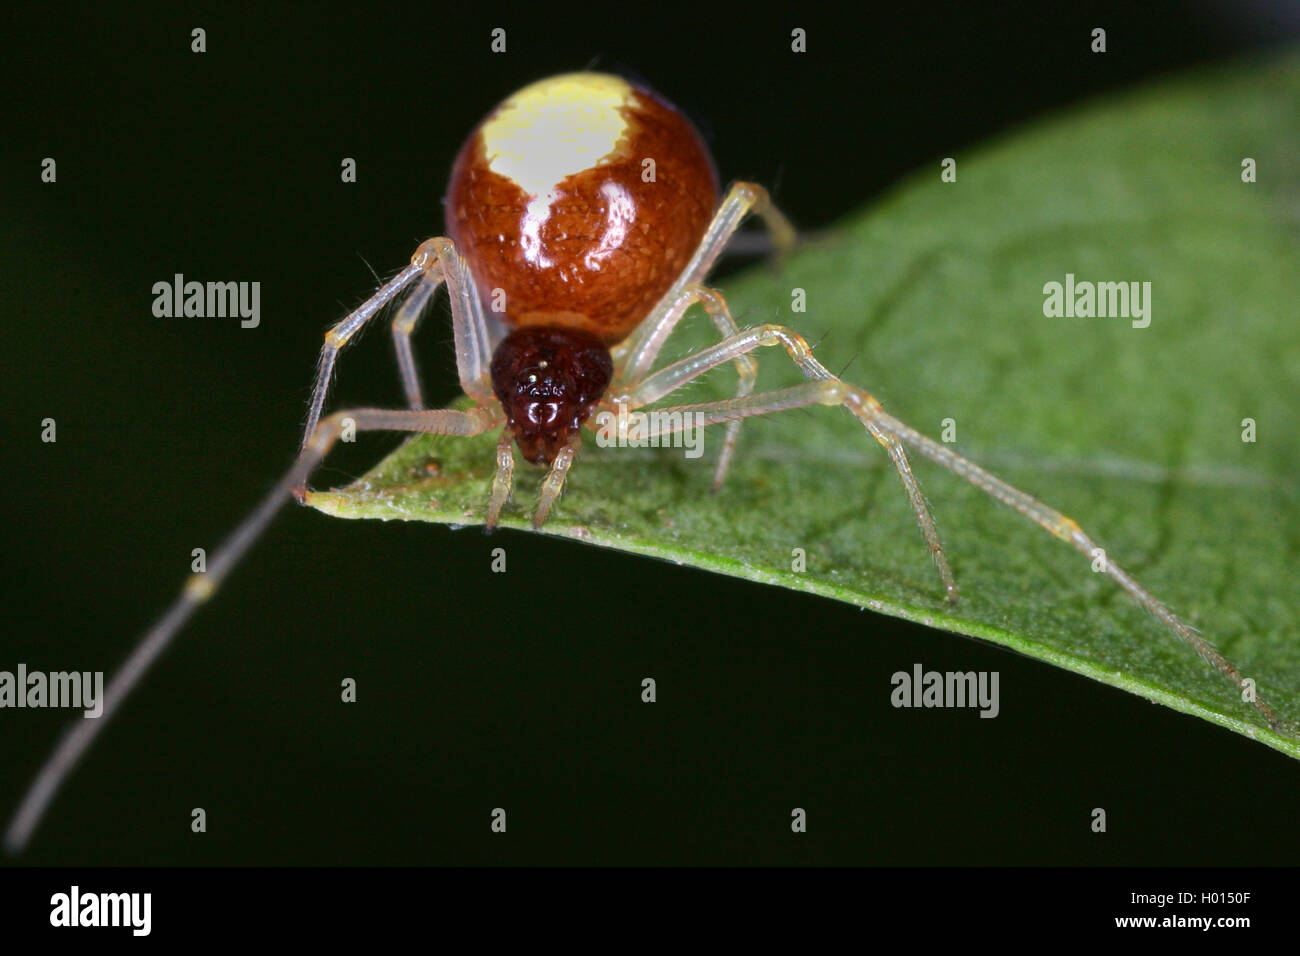 Kugelspinne, Haubennetzspinne (Theridiidae), auf einem Blatt, Oesterreich | comb-footed spider (Theridiidae), on - Stock Image